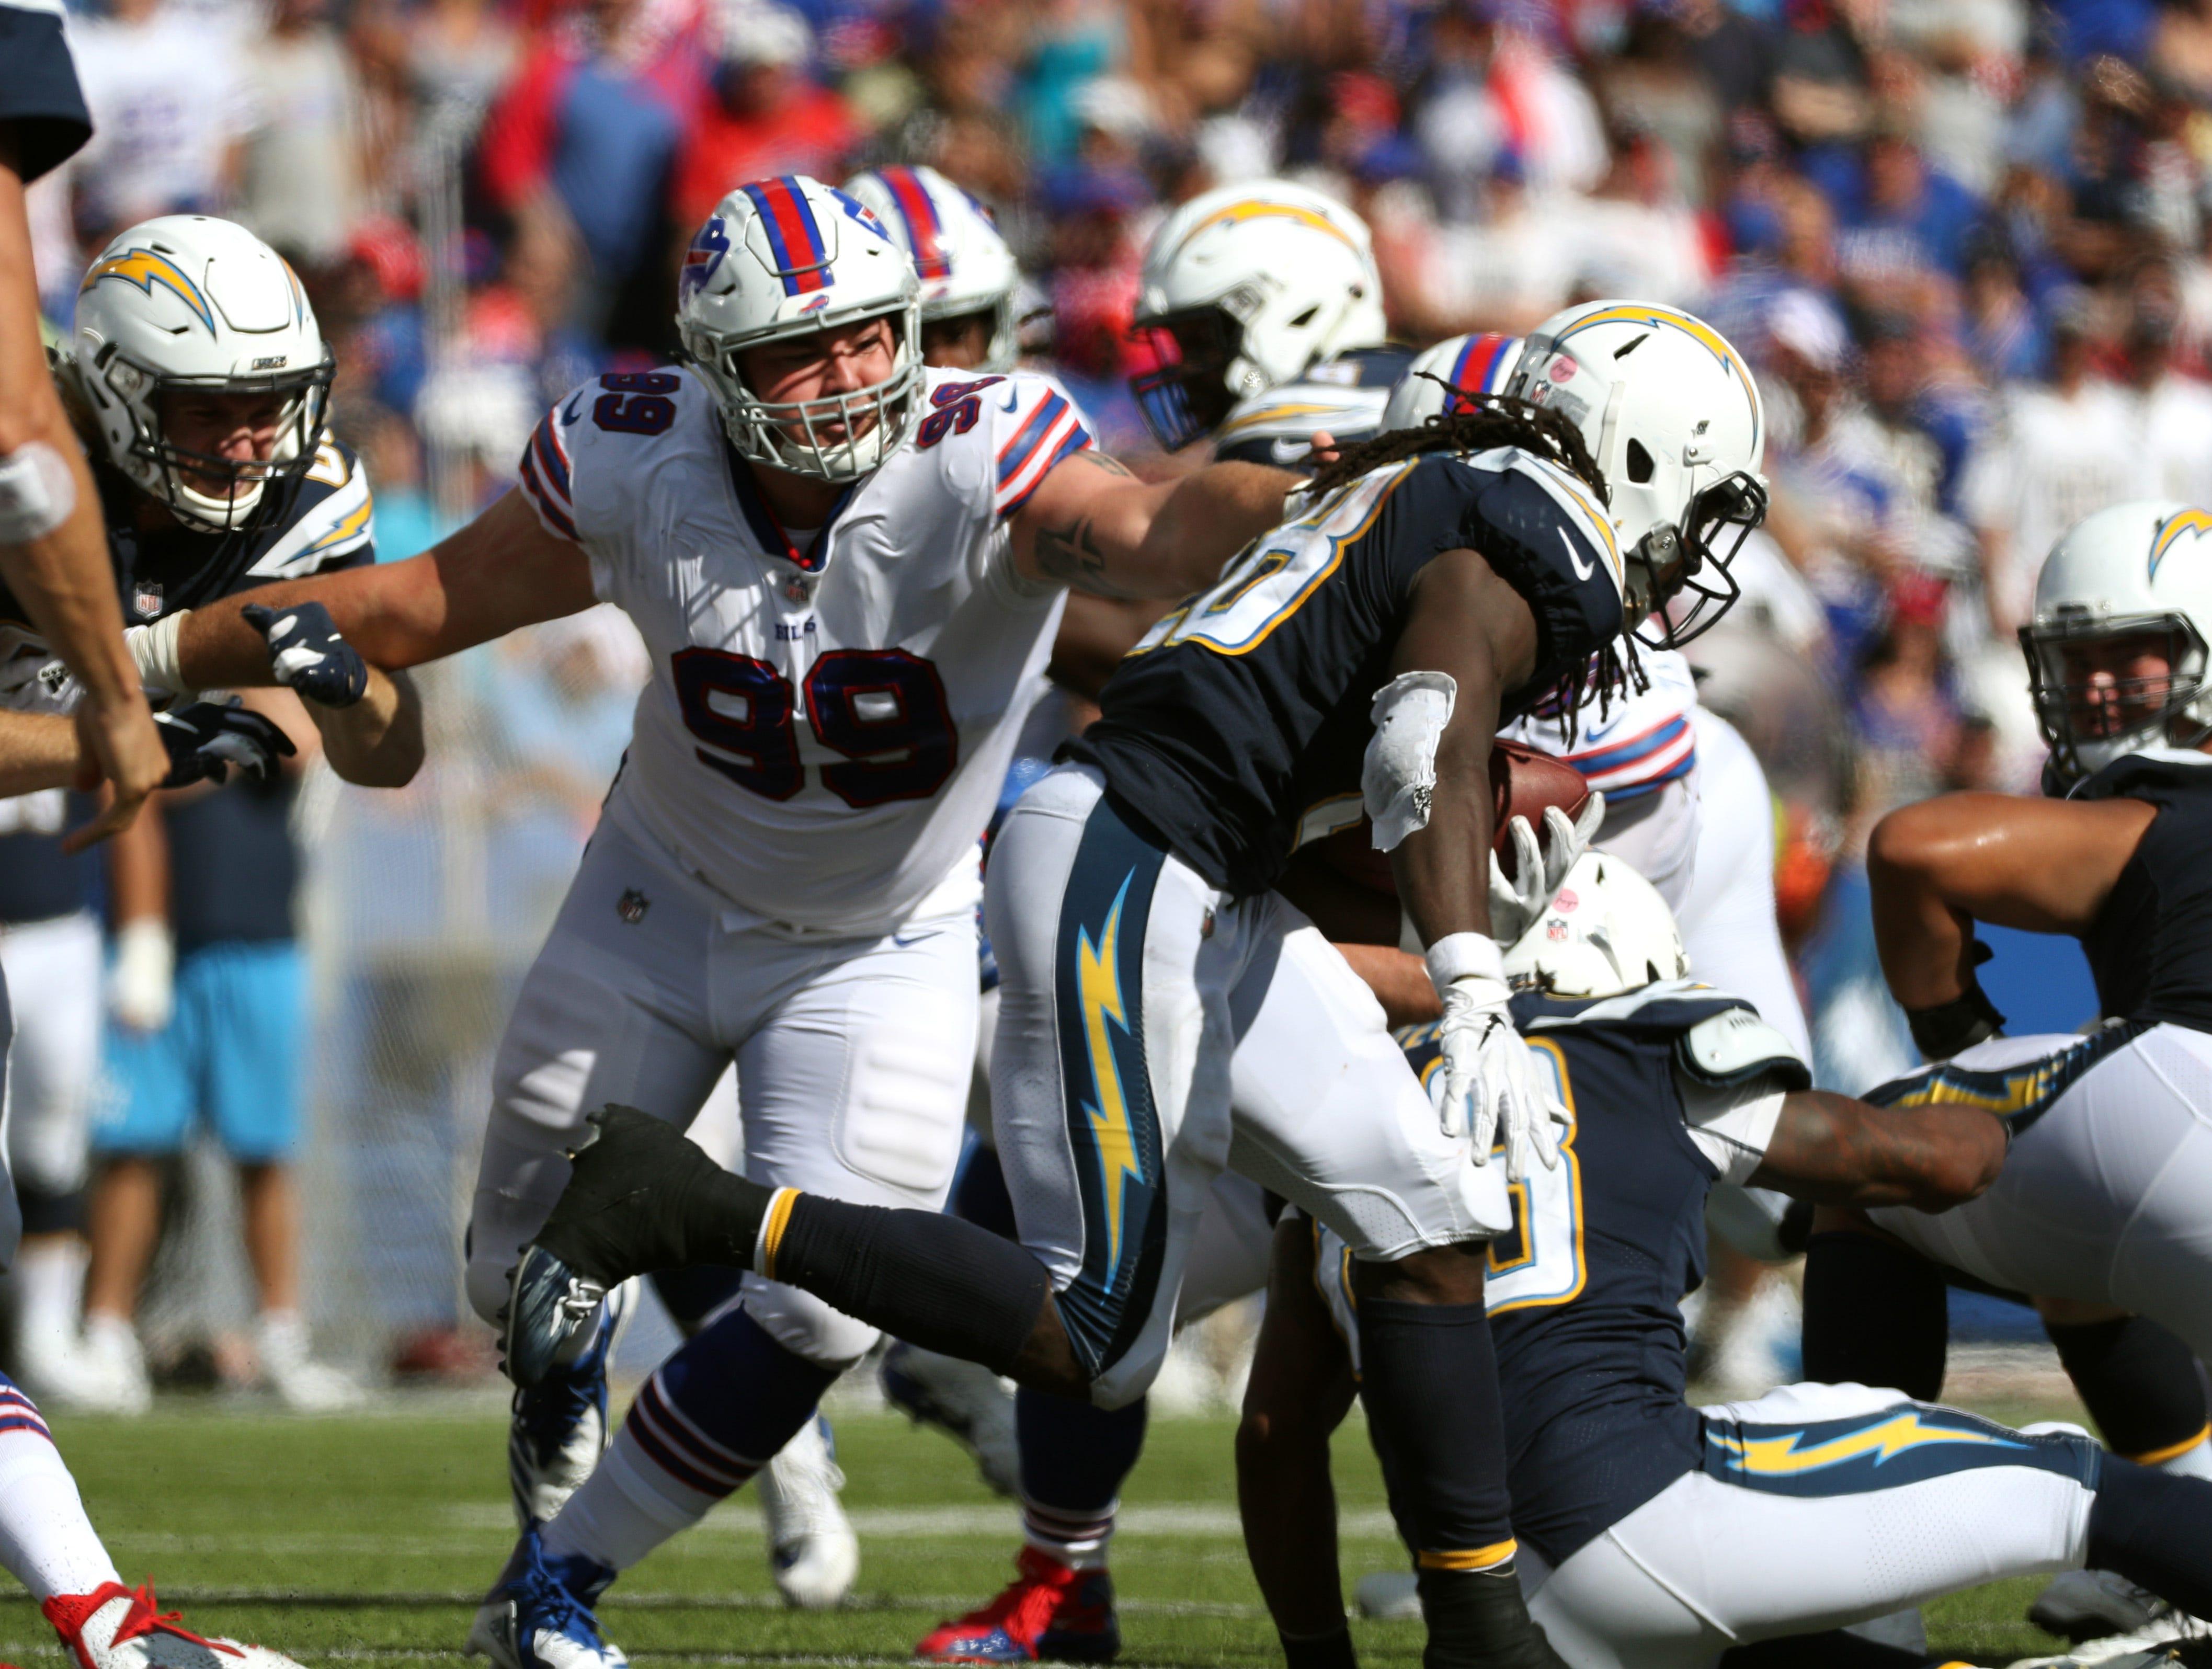 Bills rookie defensive lineman Harrison Phillips breaks through the line.